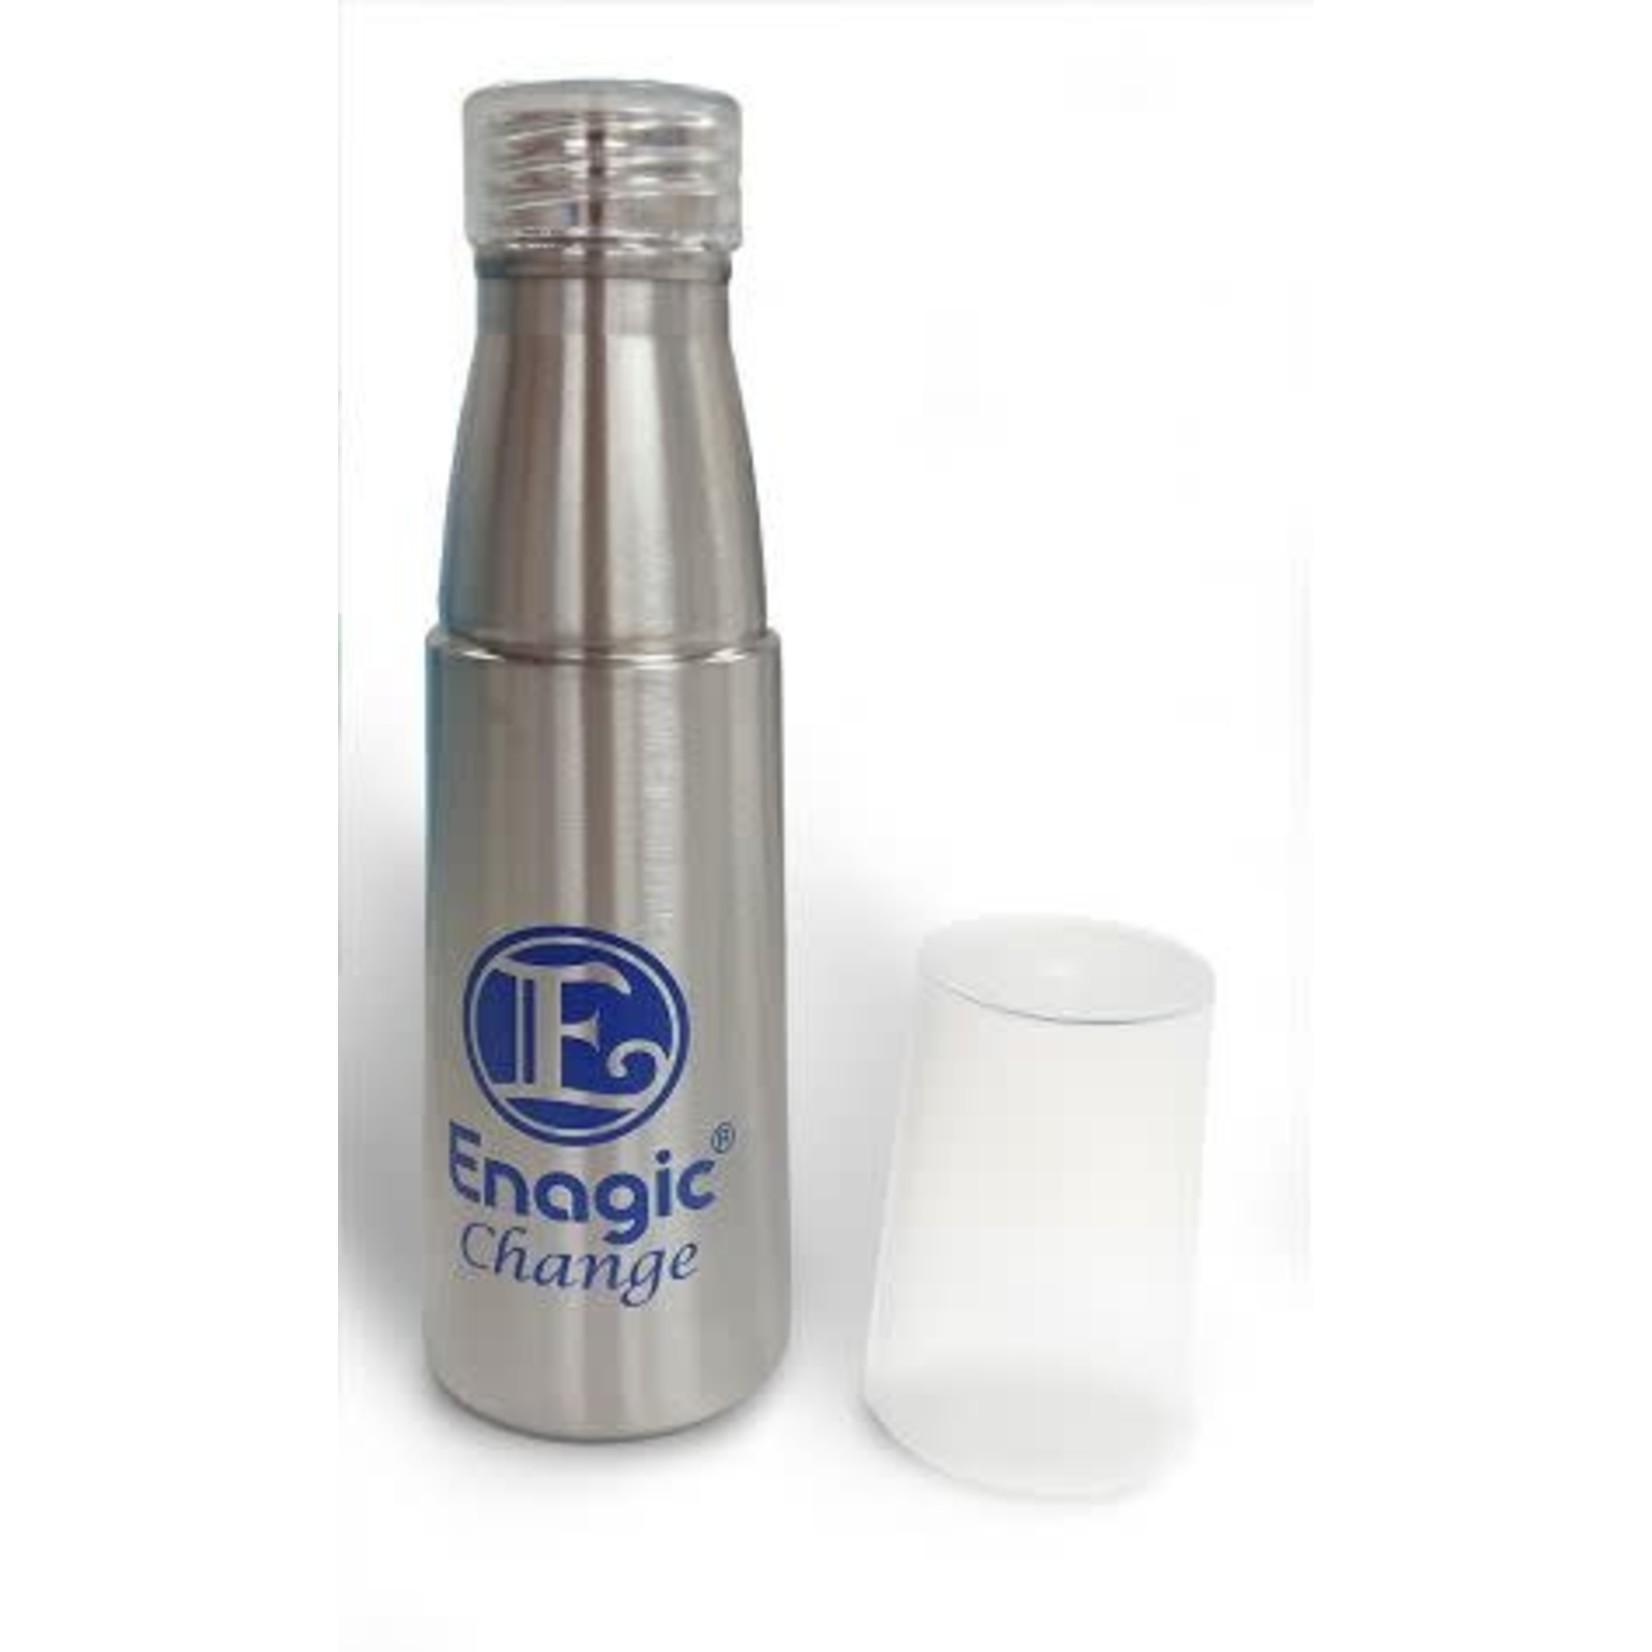 Enagic Enagic E1 Kangen Water Stainless Steel Water Bottle